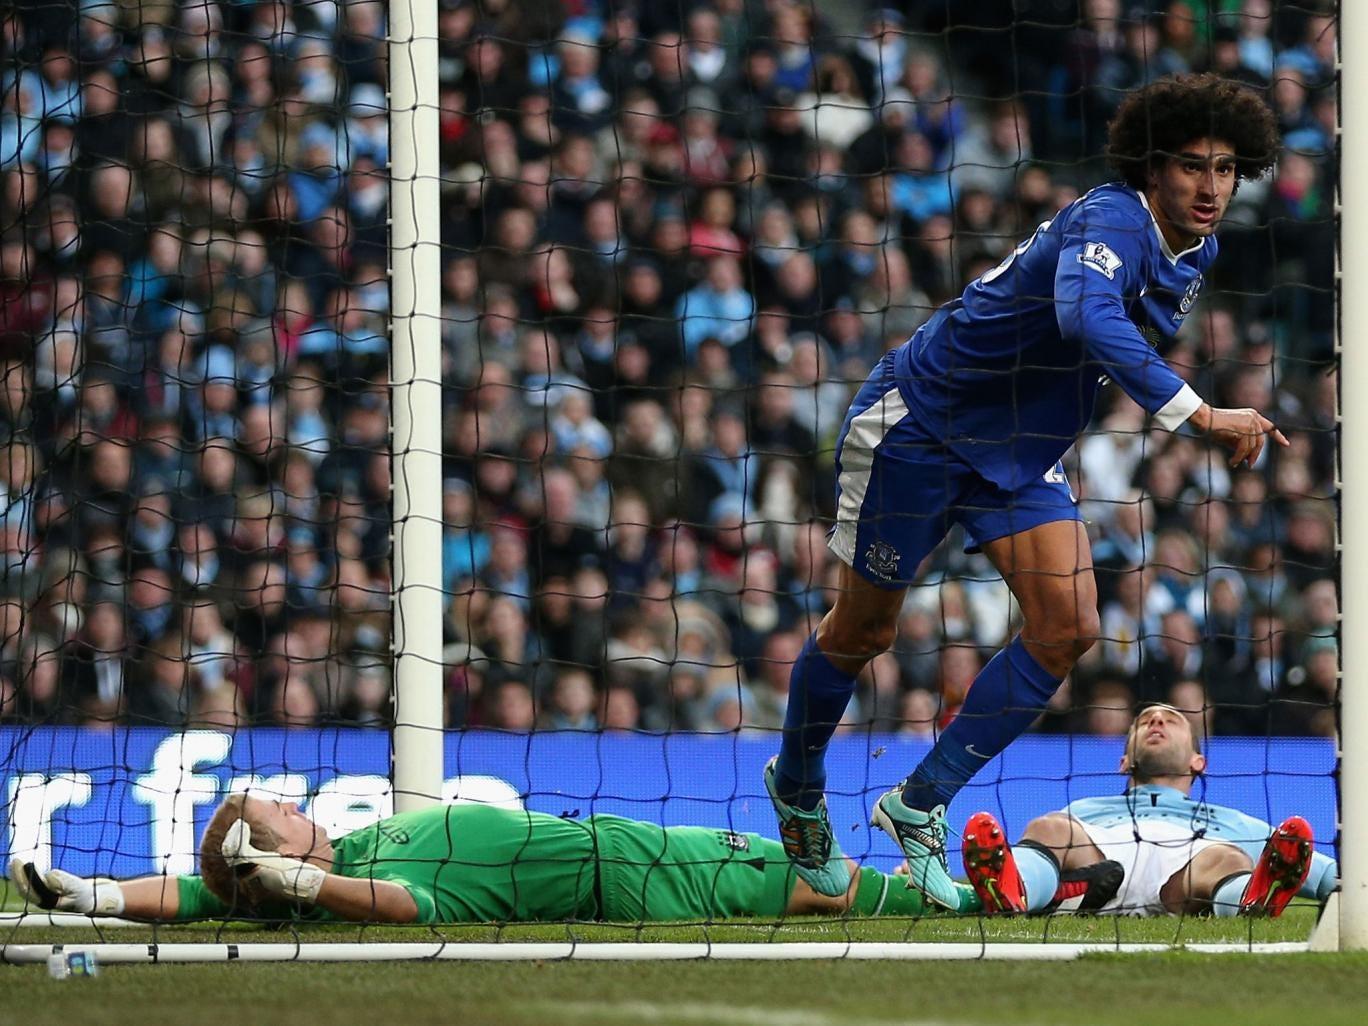 Maraoune Fellaini celebrates after scoring his goal against Manchester City